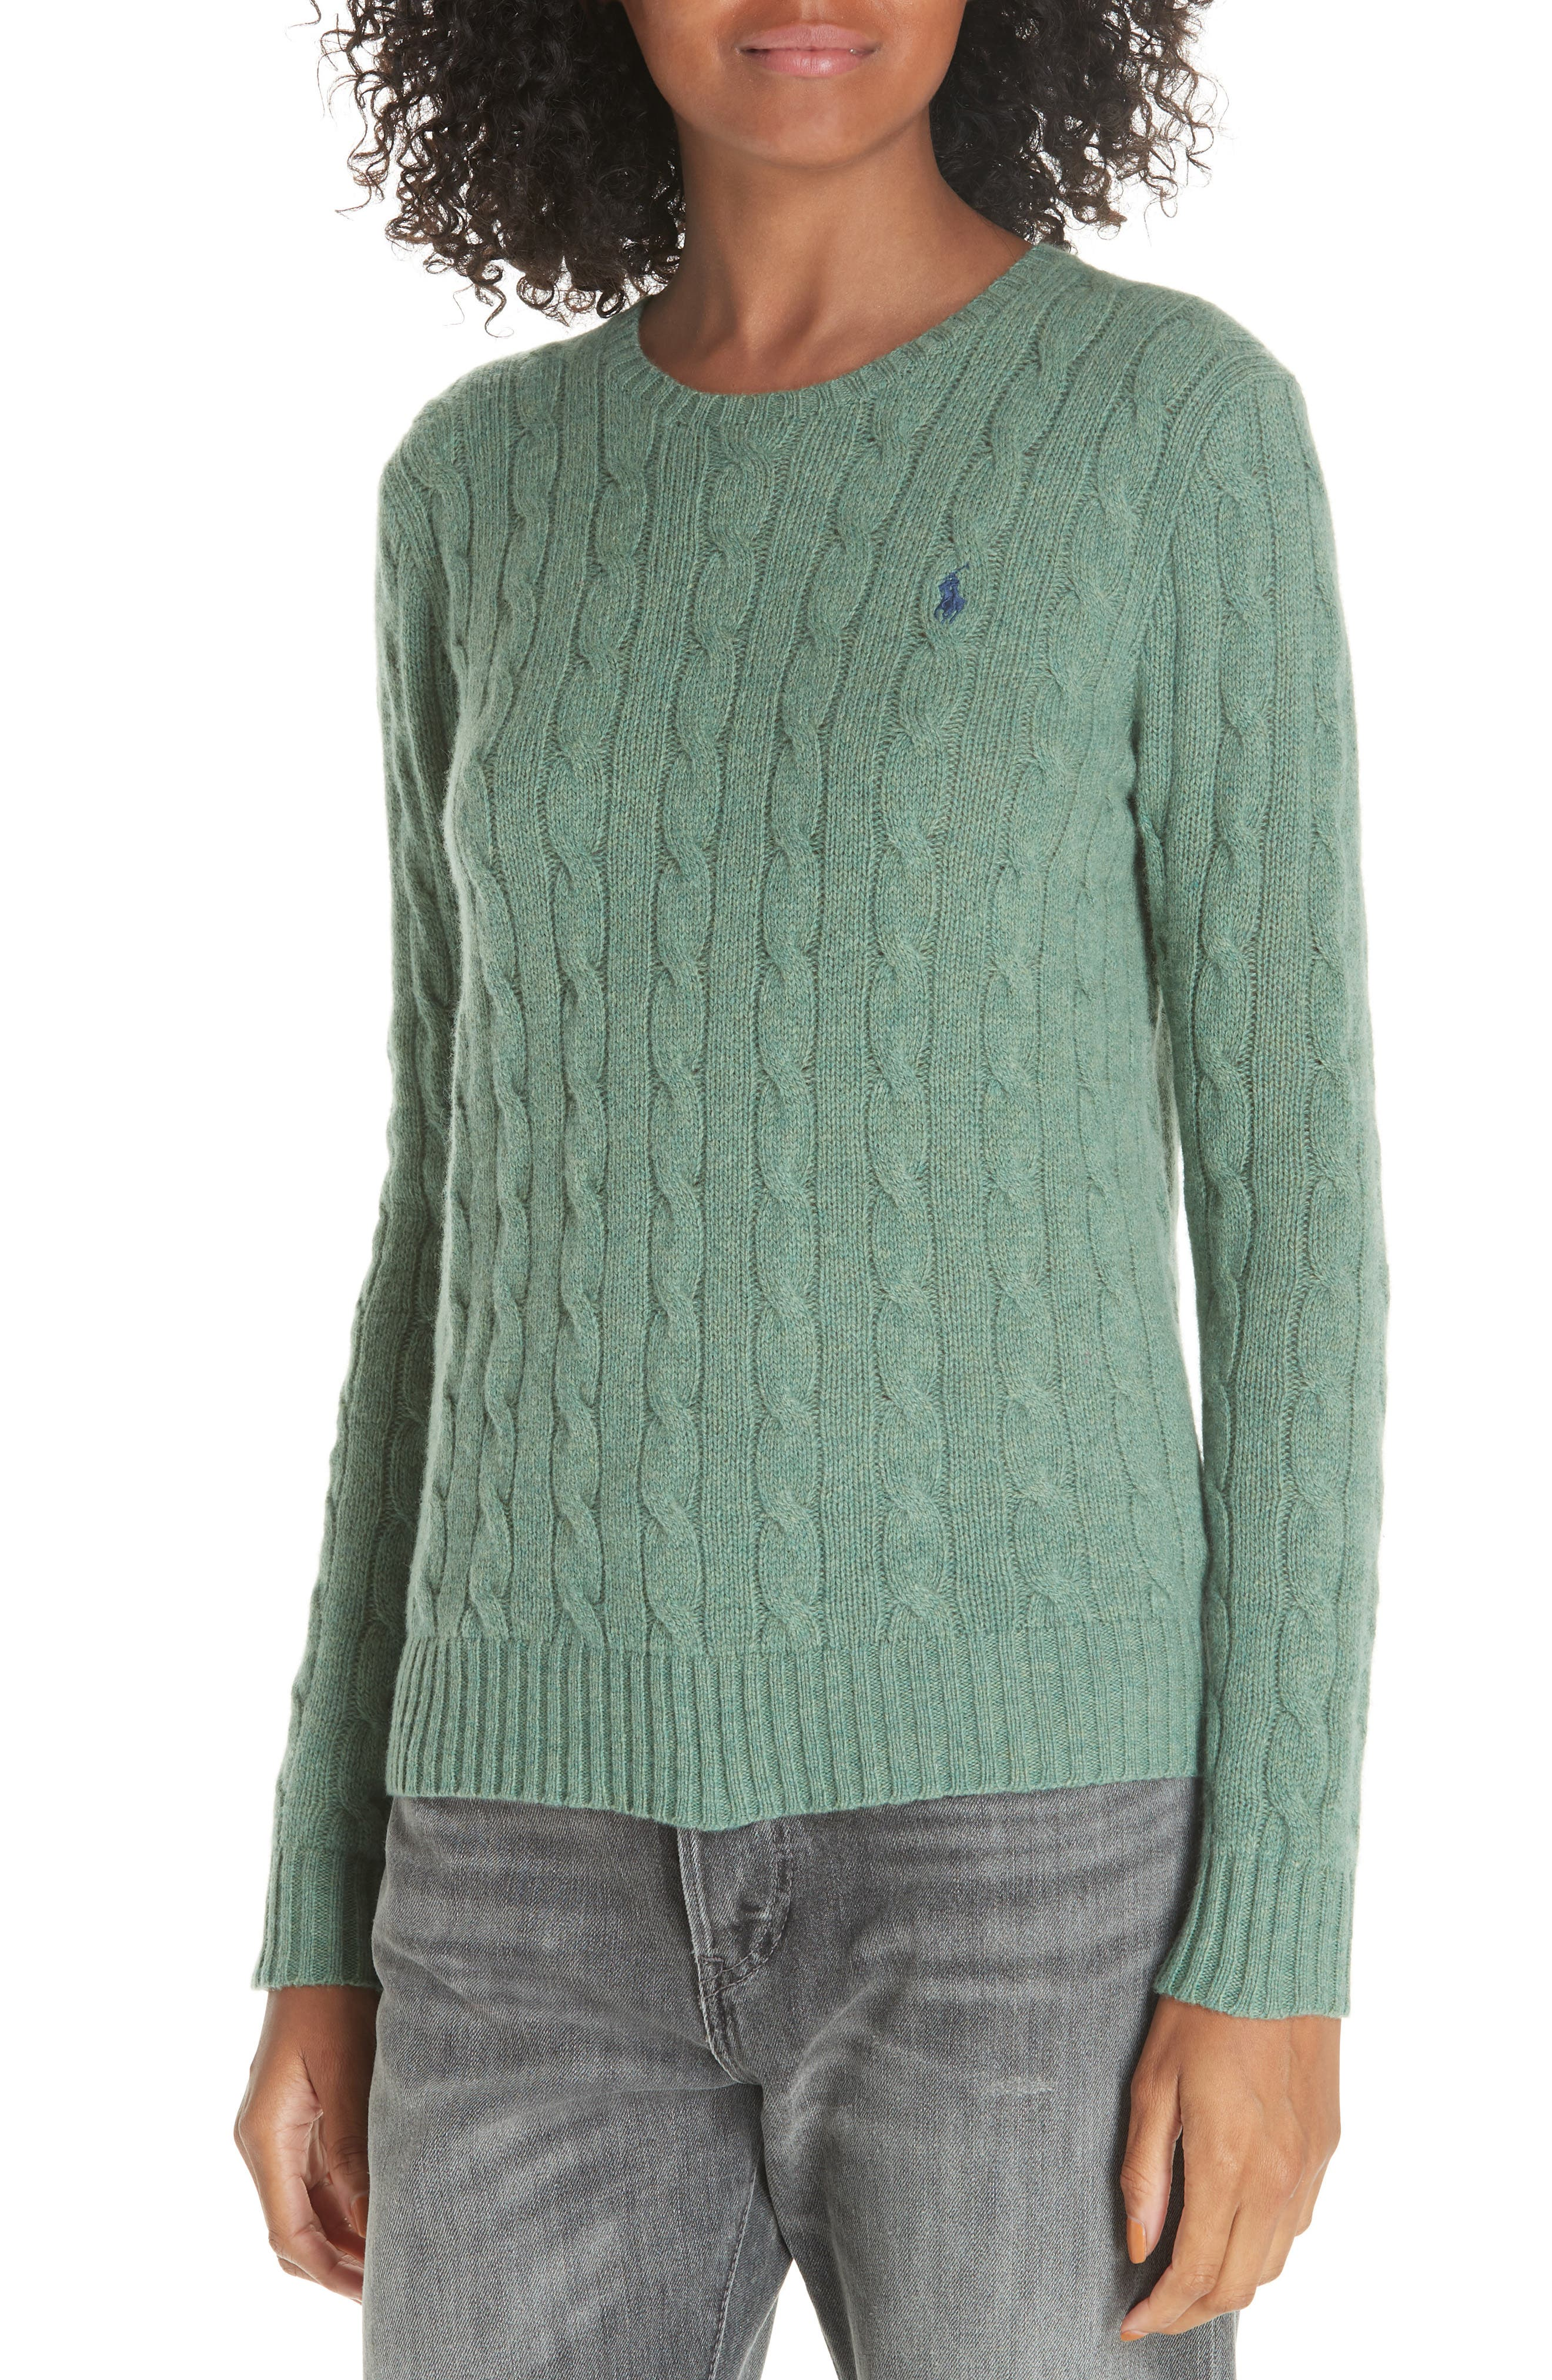 POLO RALPH LAUREN, Cable Knit Cotton Sweater, Alternate thumbnail 4, color, 300